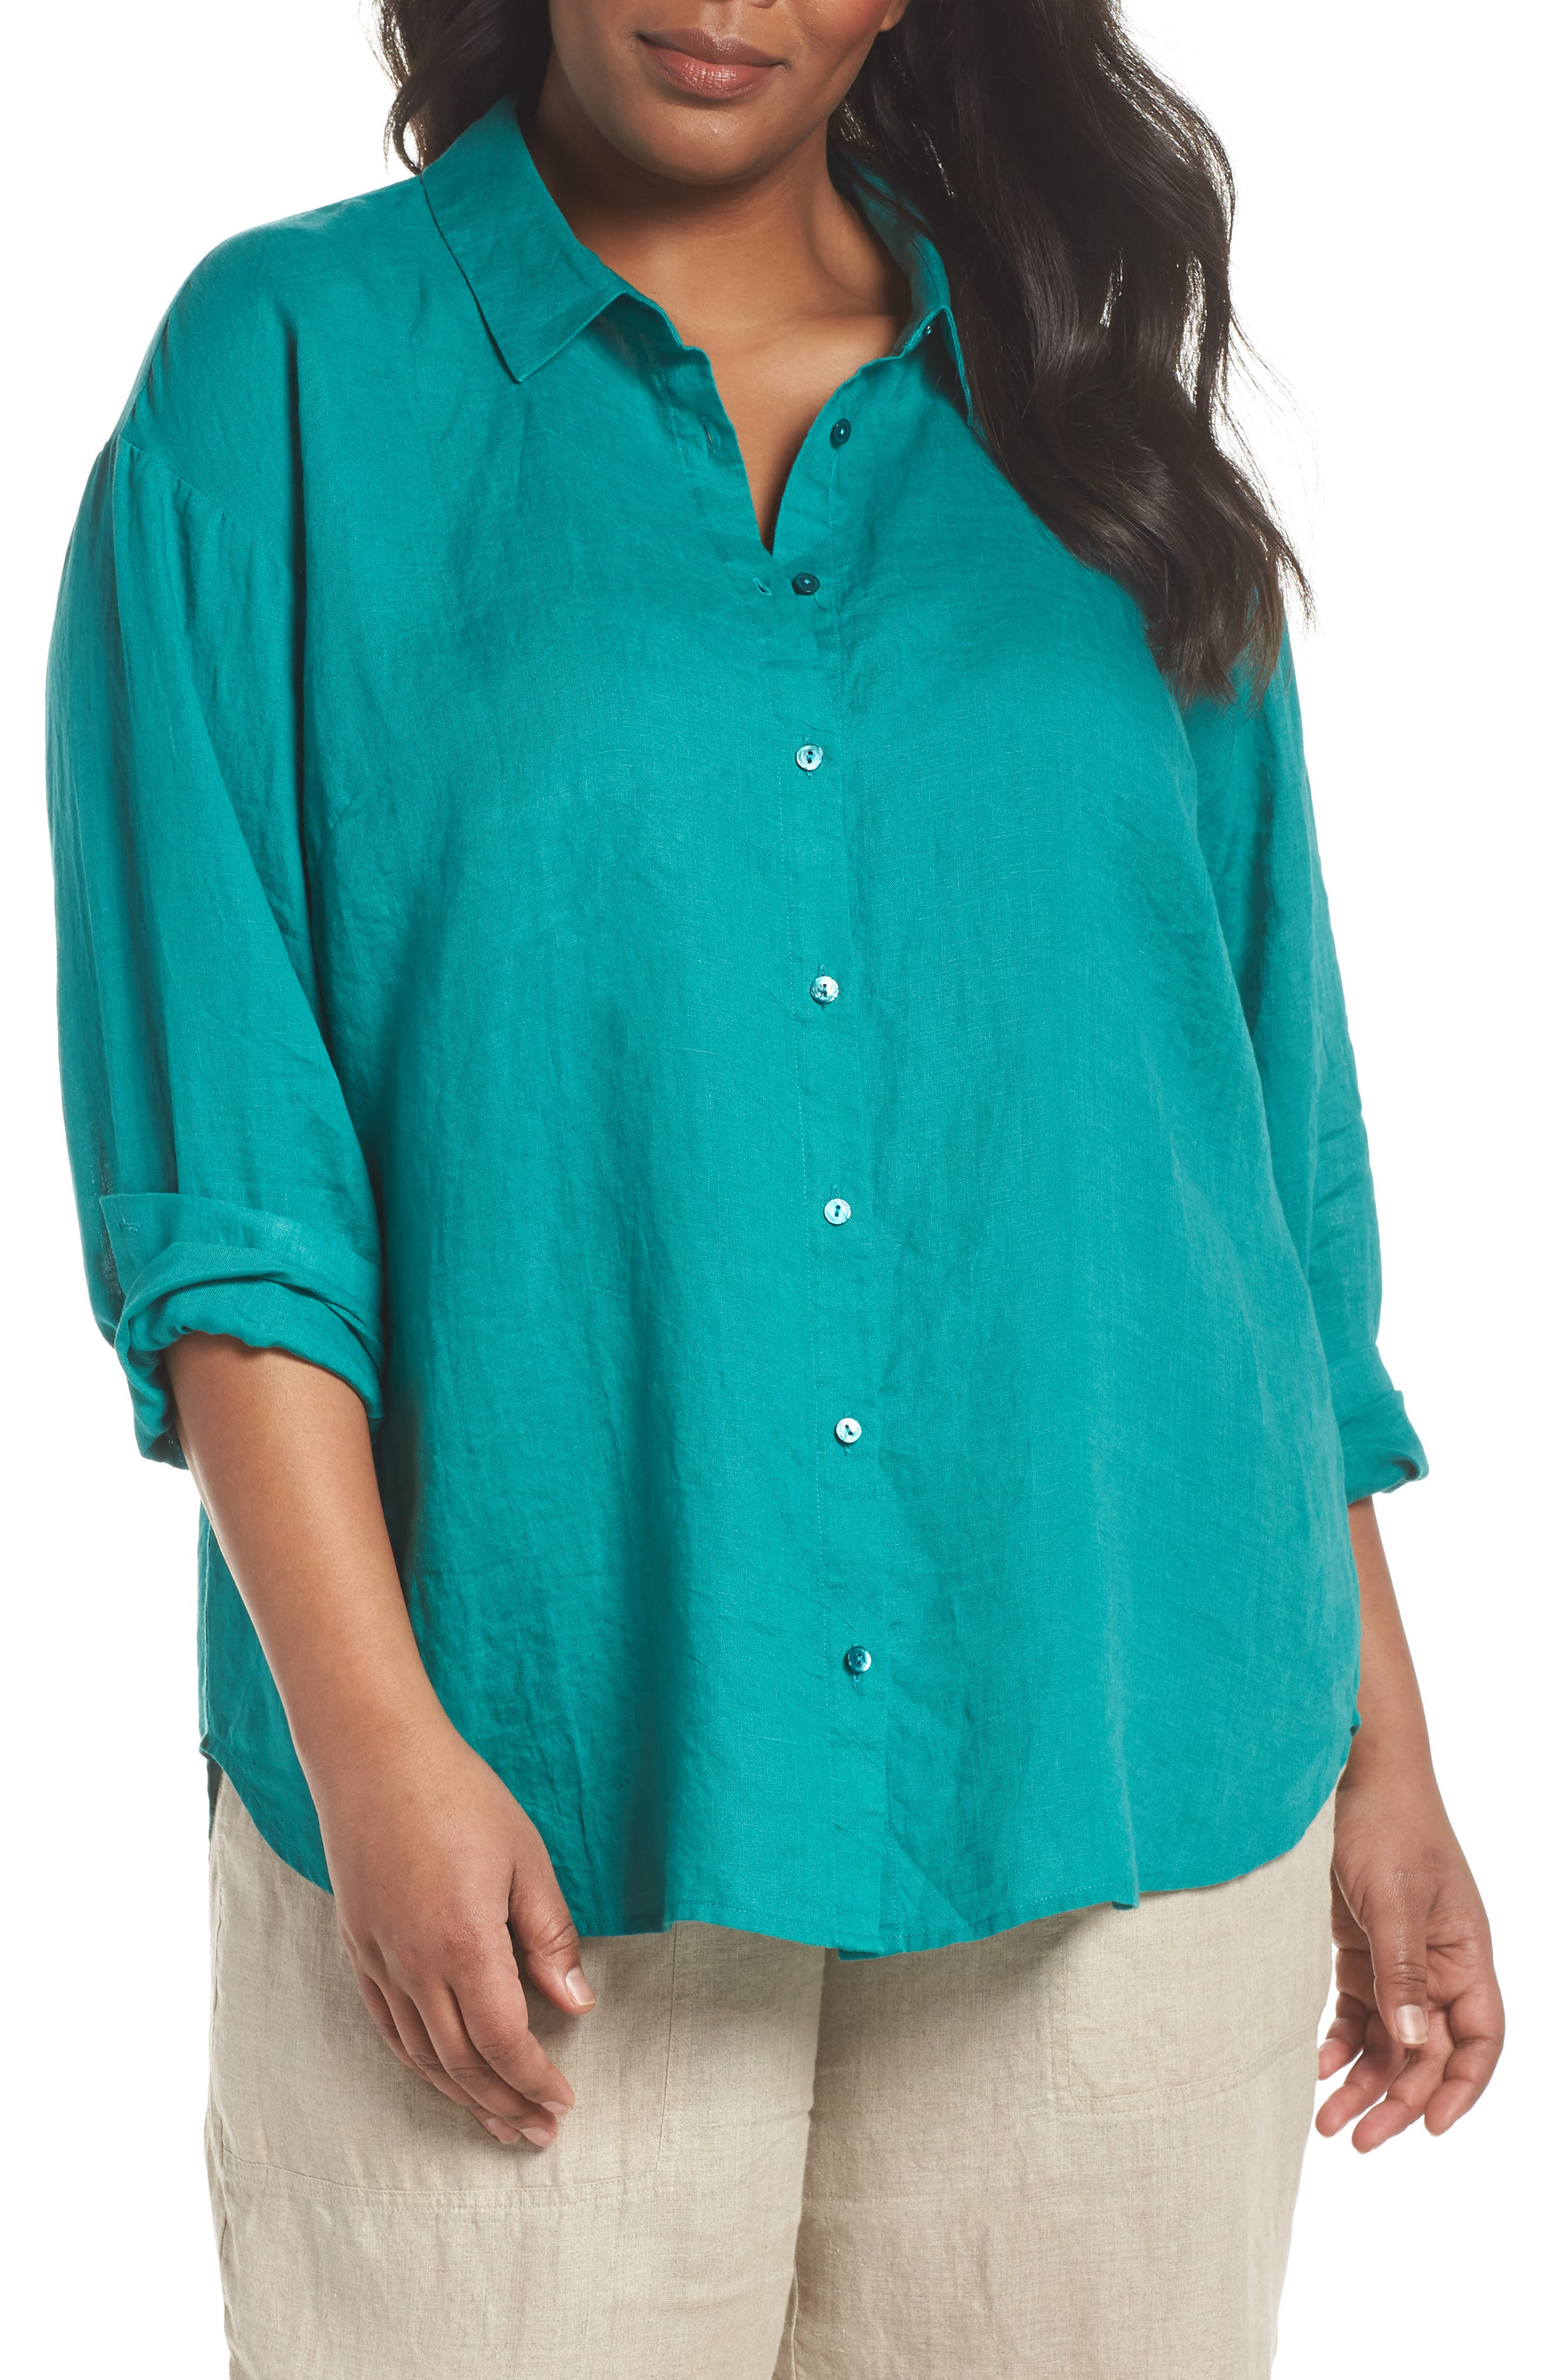 Organic Linen Shirt,                             Main thumbnail 1, color,                             Turquoise